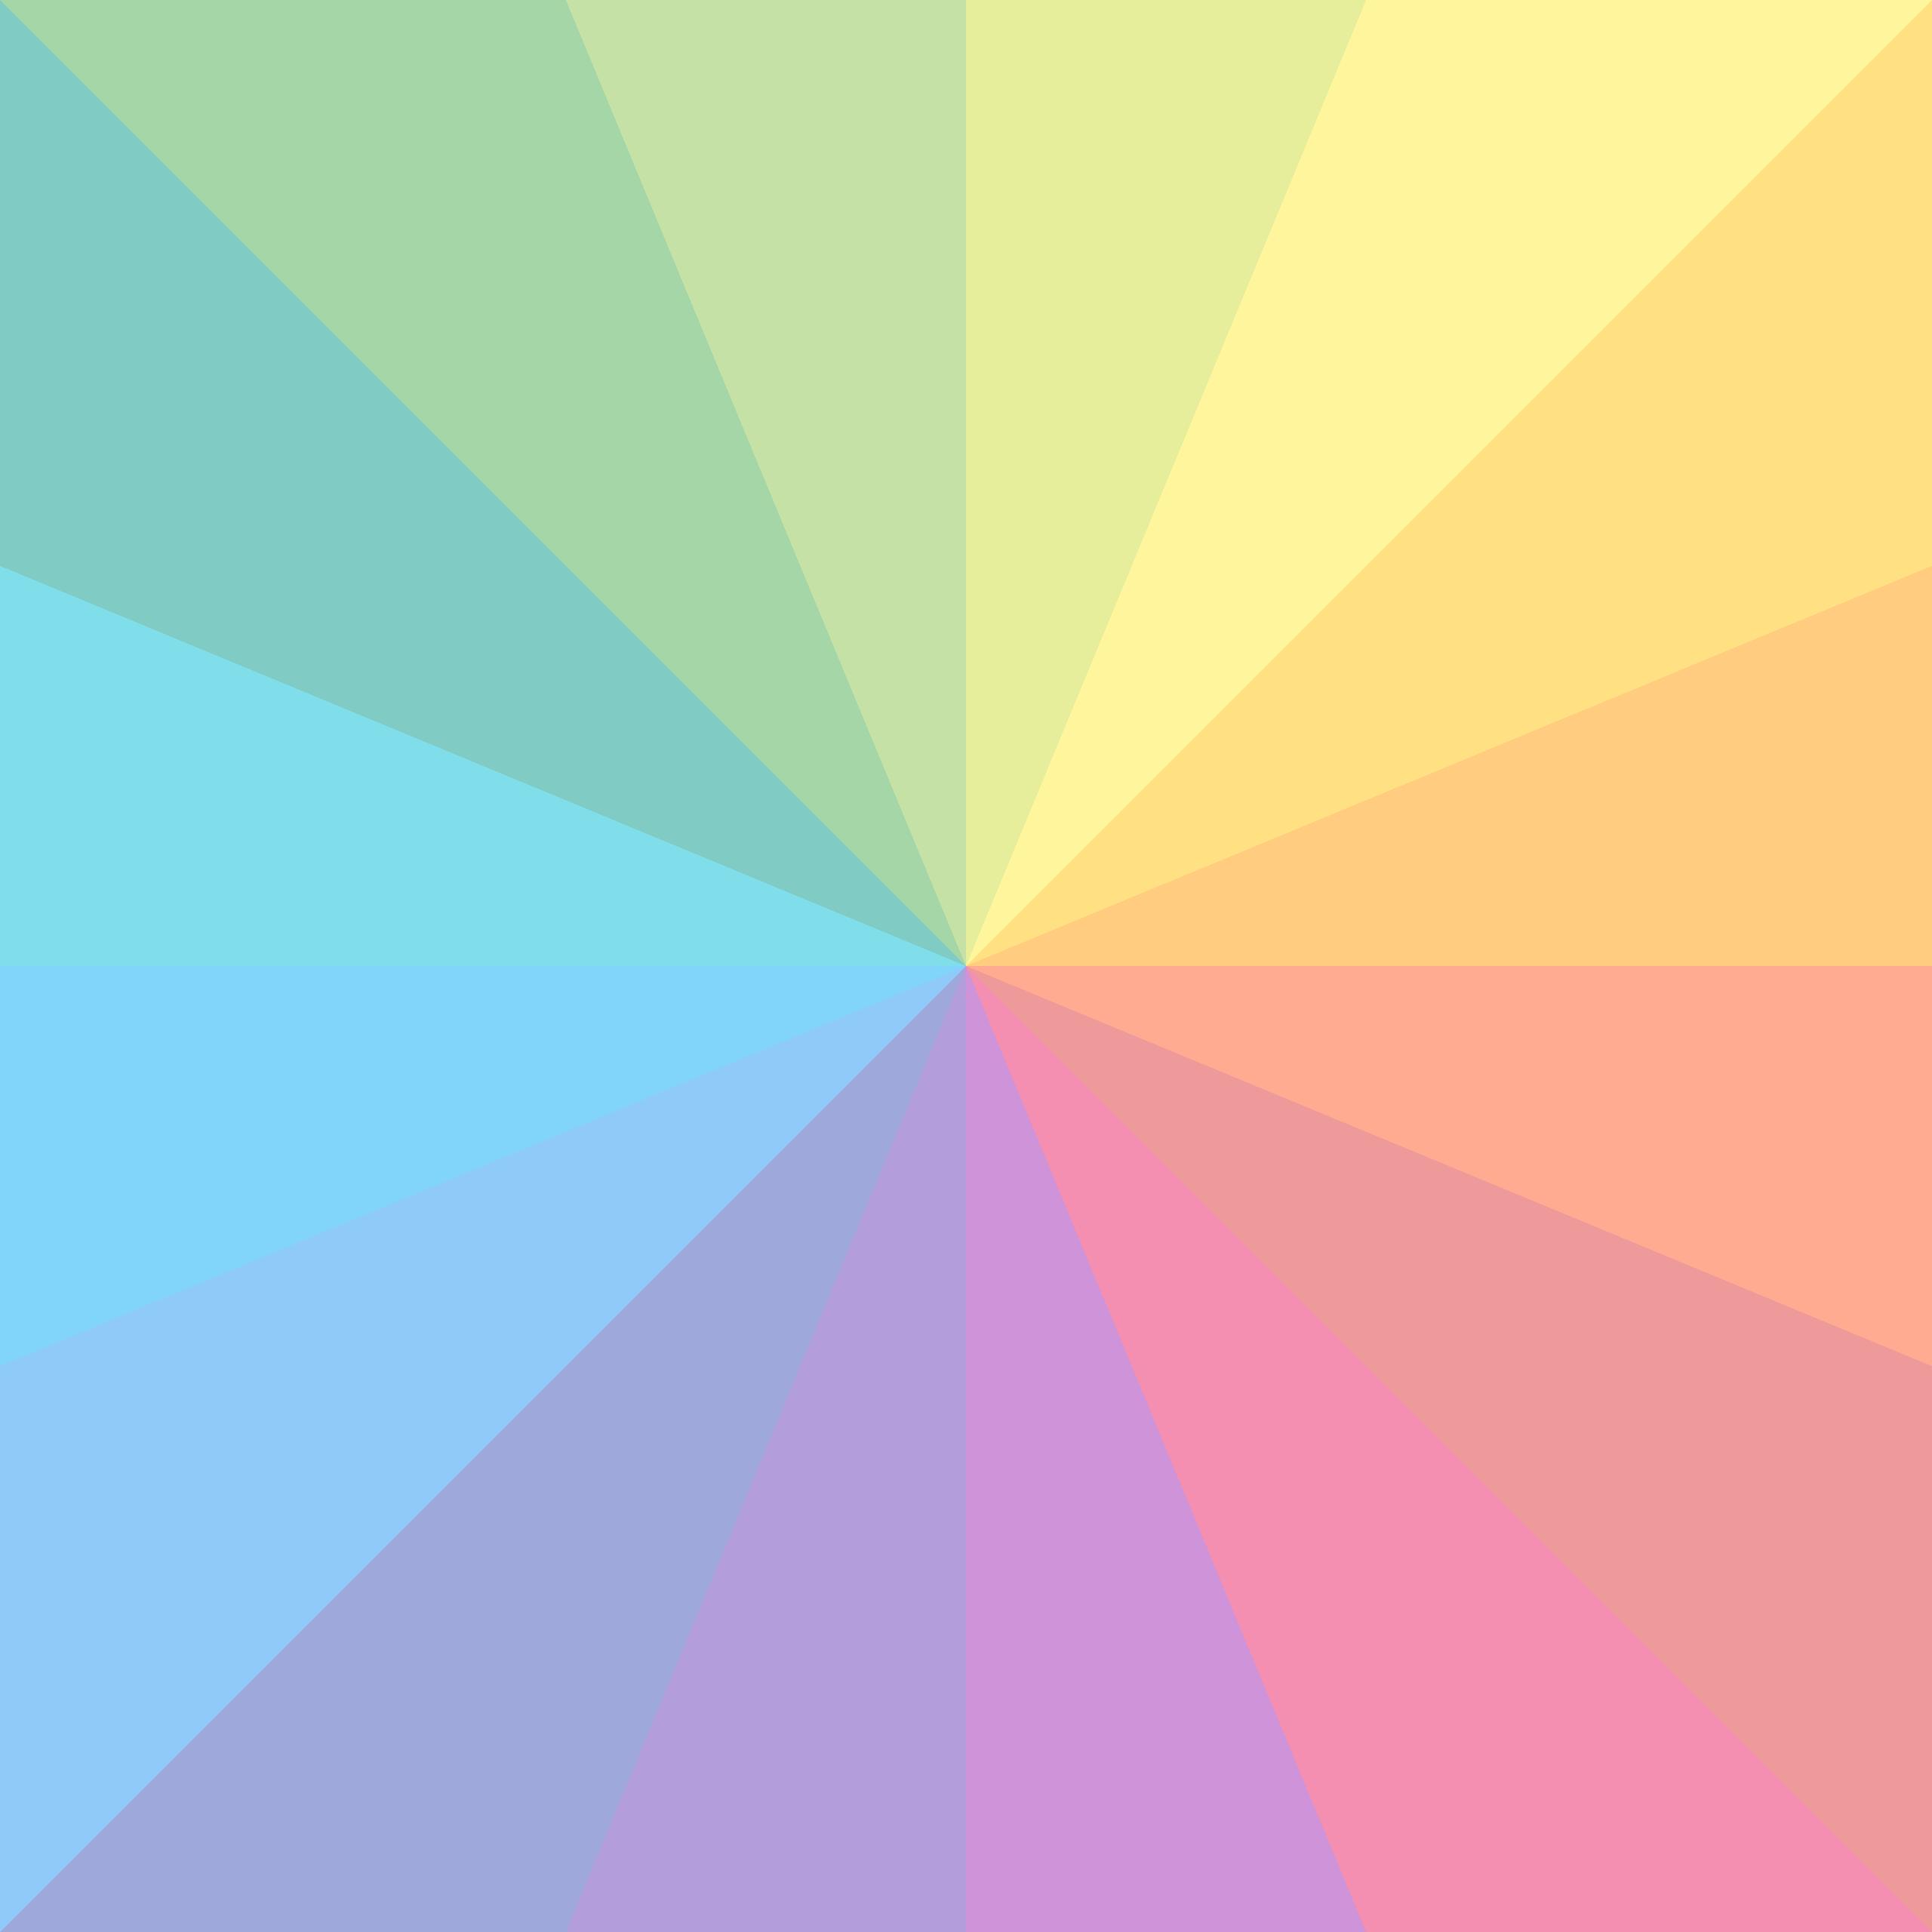 app/src/main/res/drawable-xxxhdpi/ic_splash_background.png